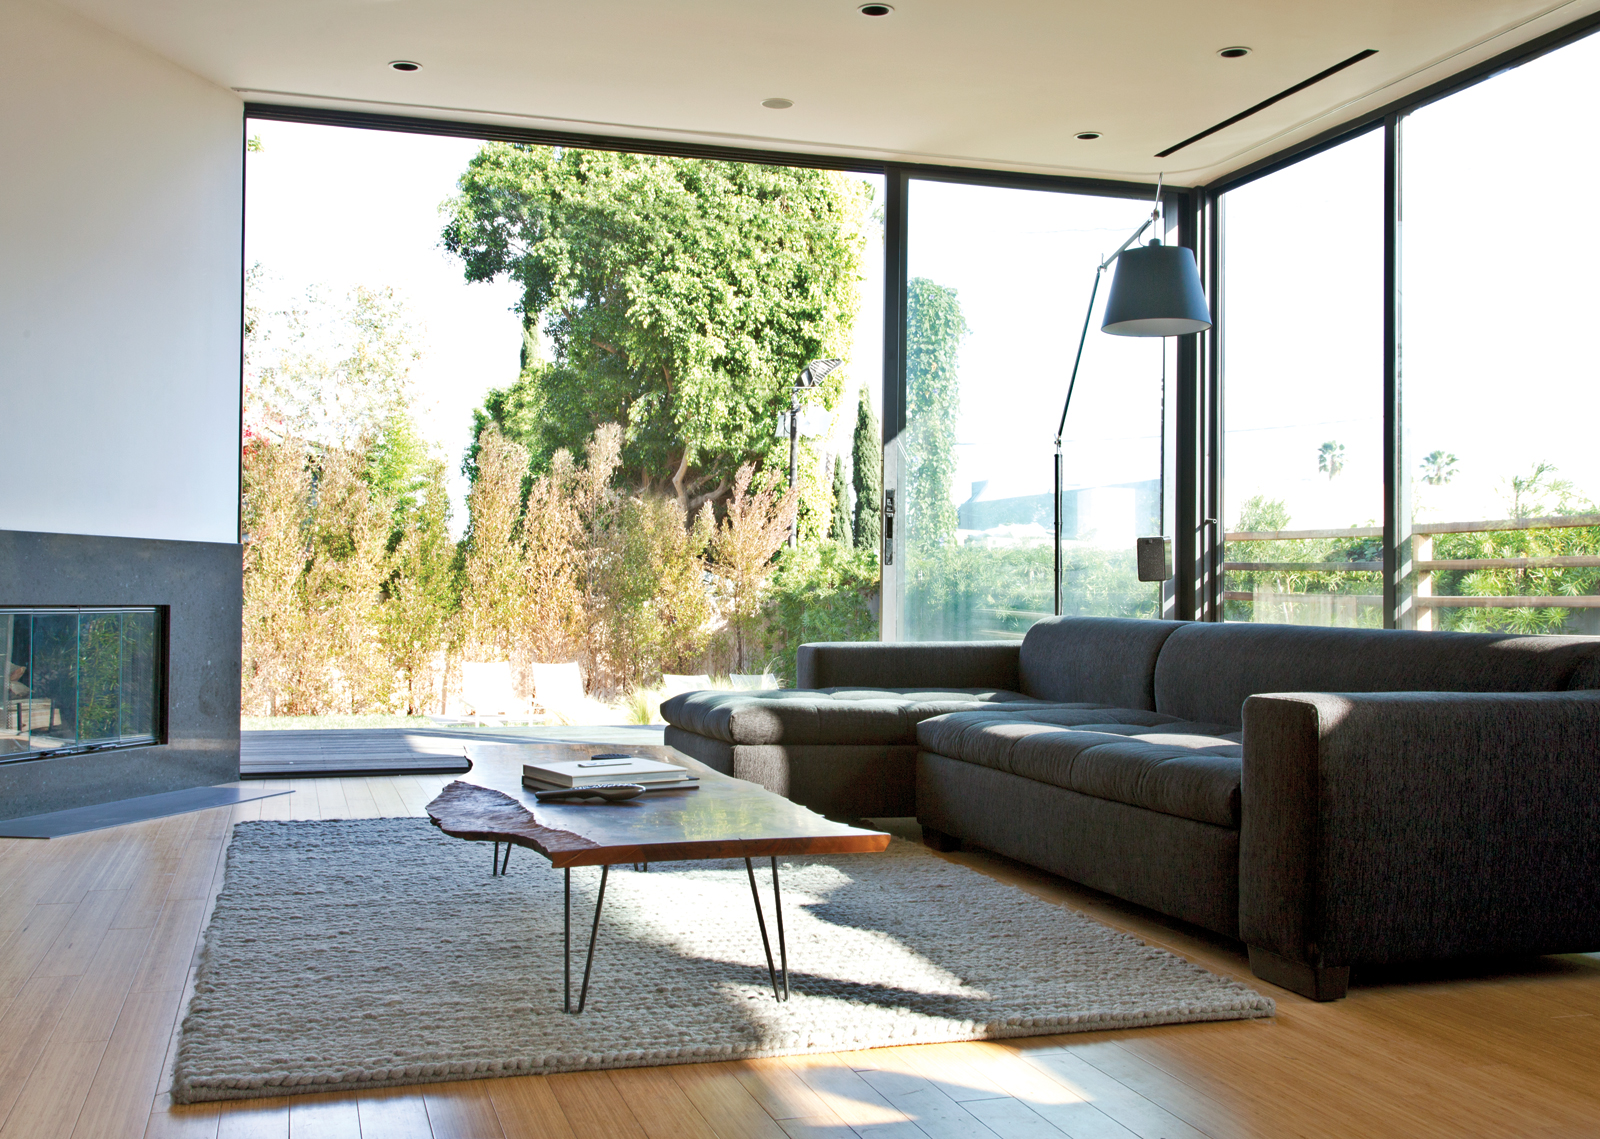 Urban living room with tall glass windows